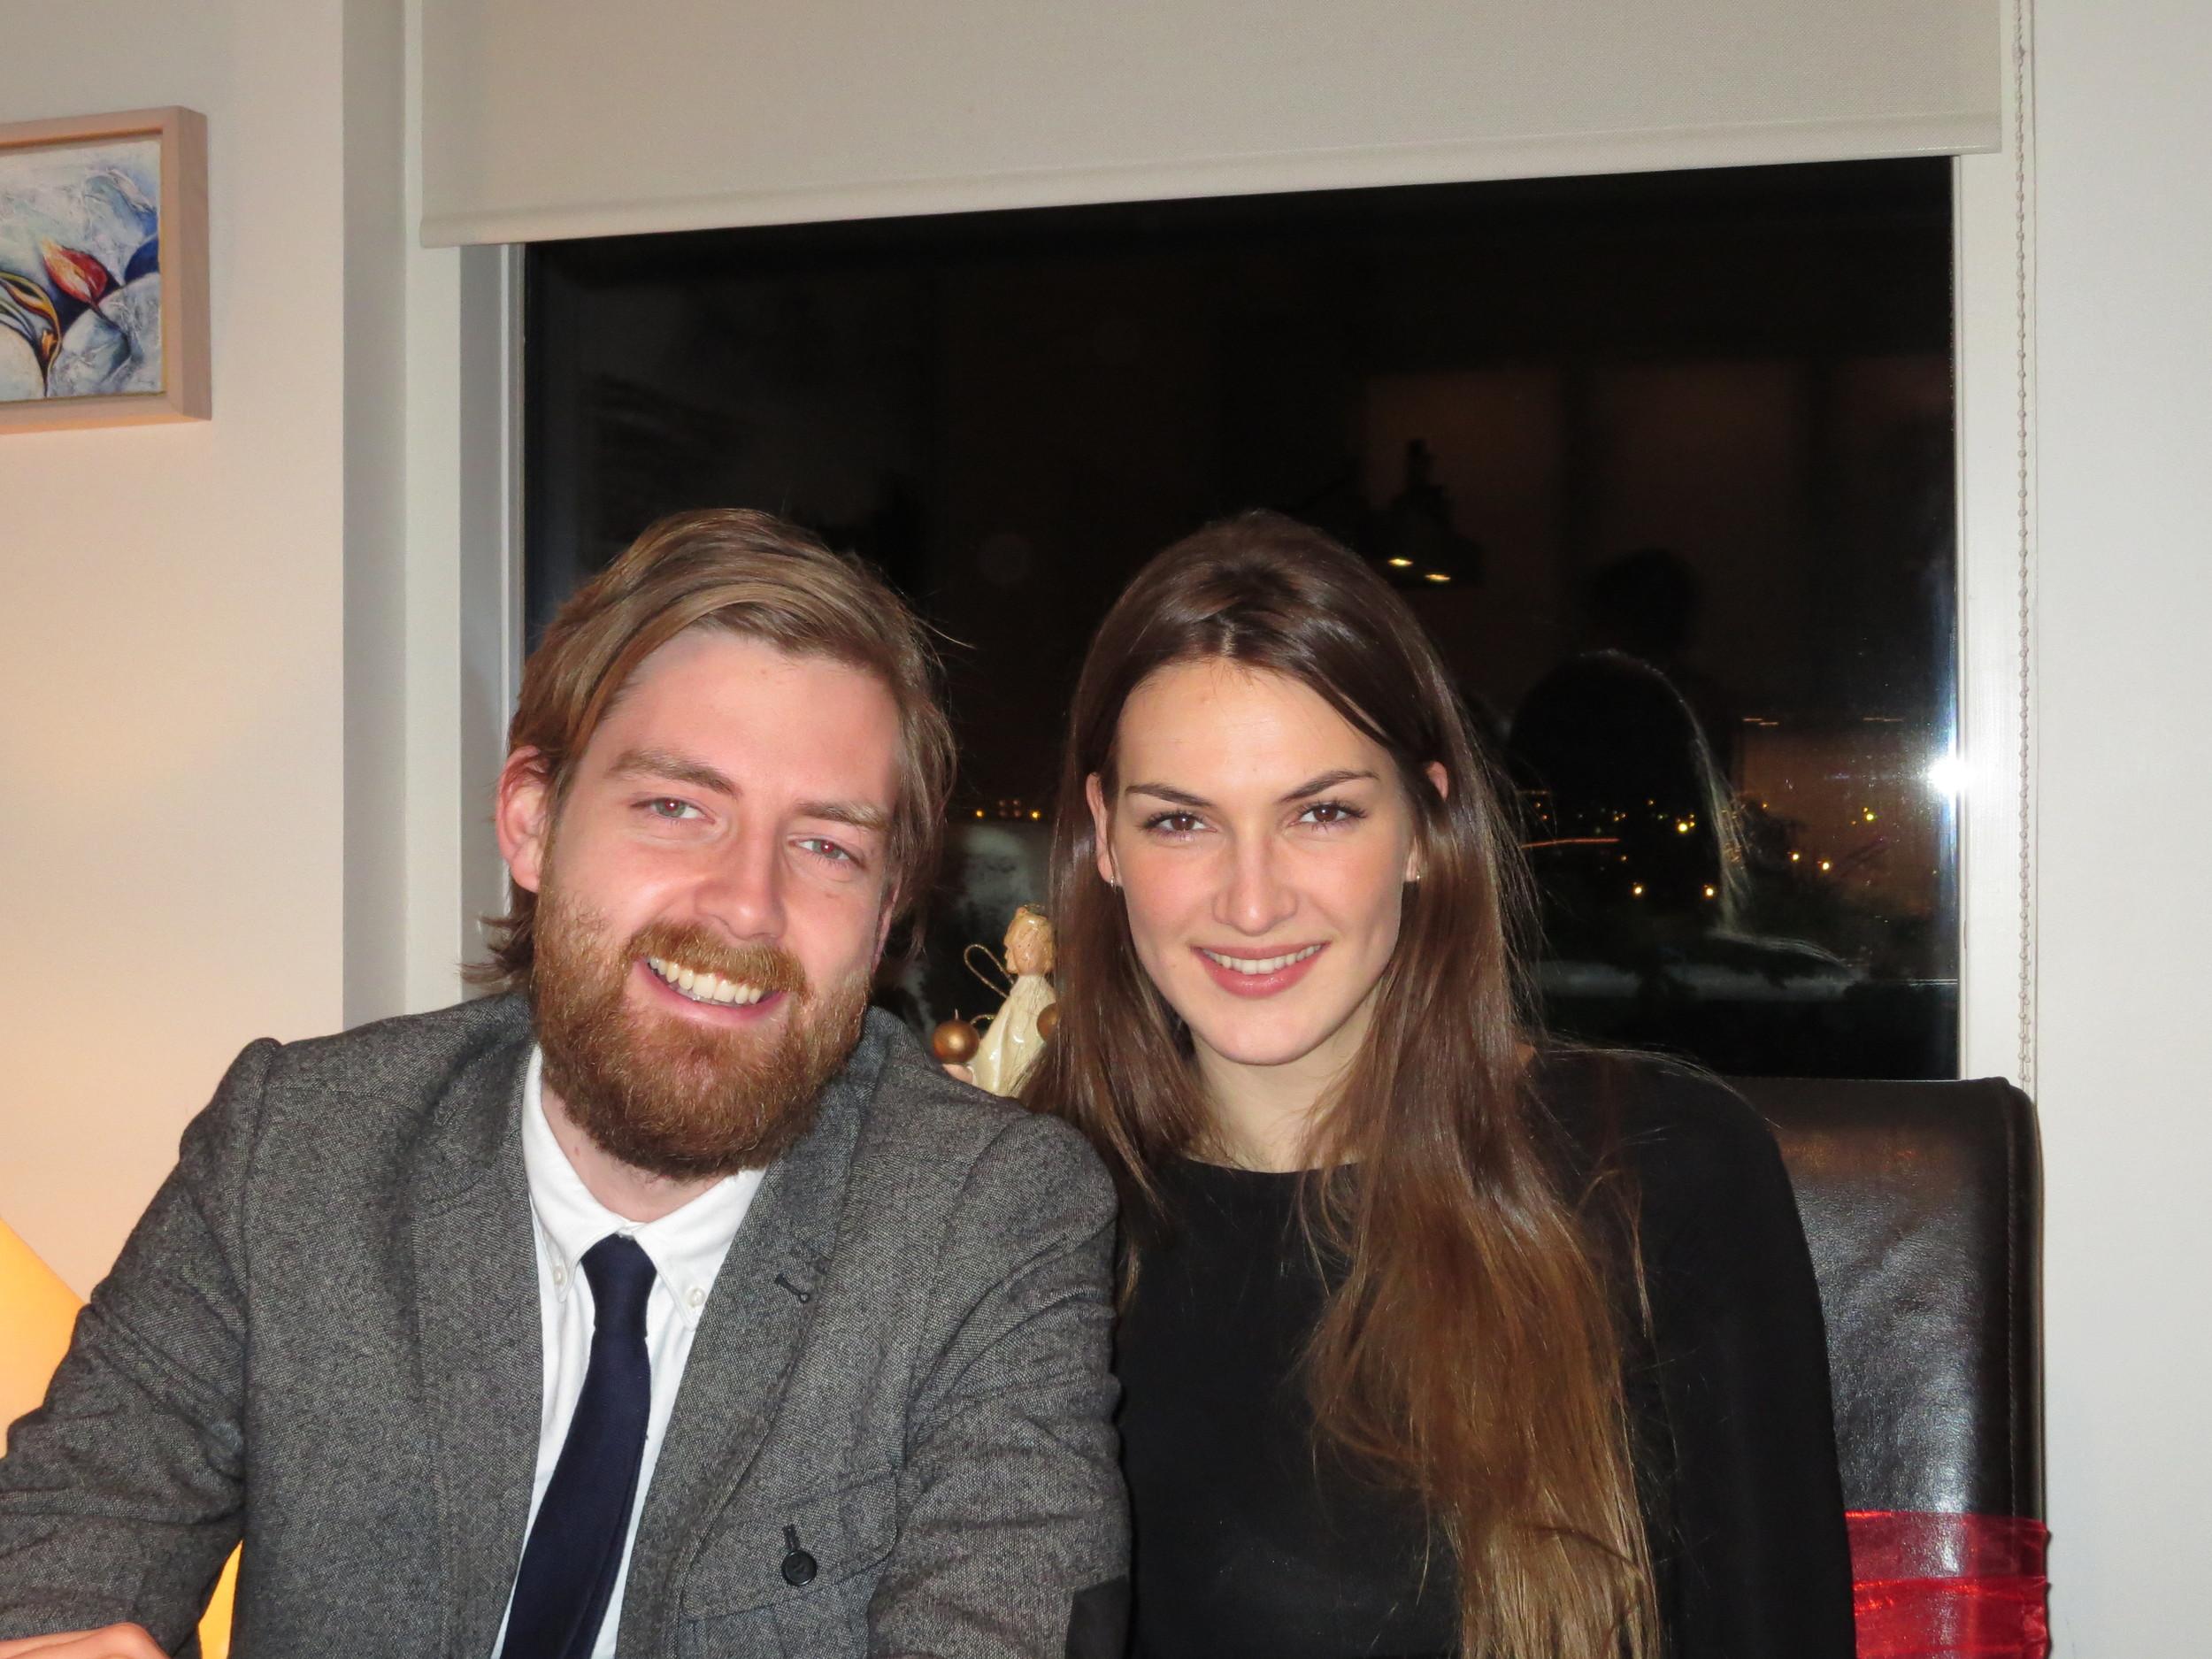 Rúnar Ingi, Ditta´s son, with his girlfriend, Soffia